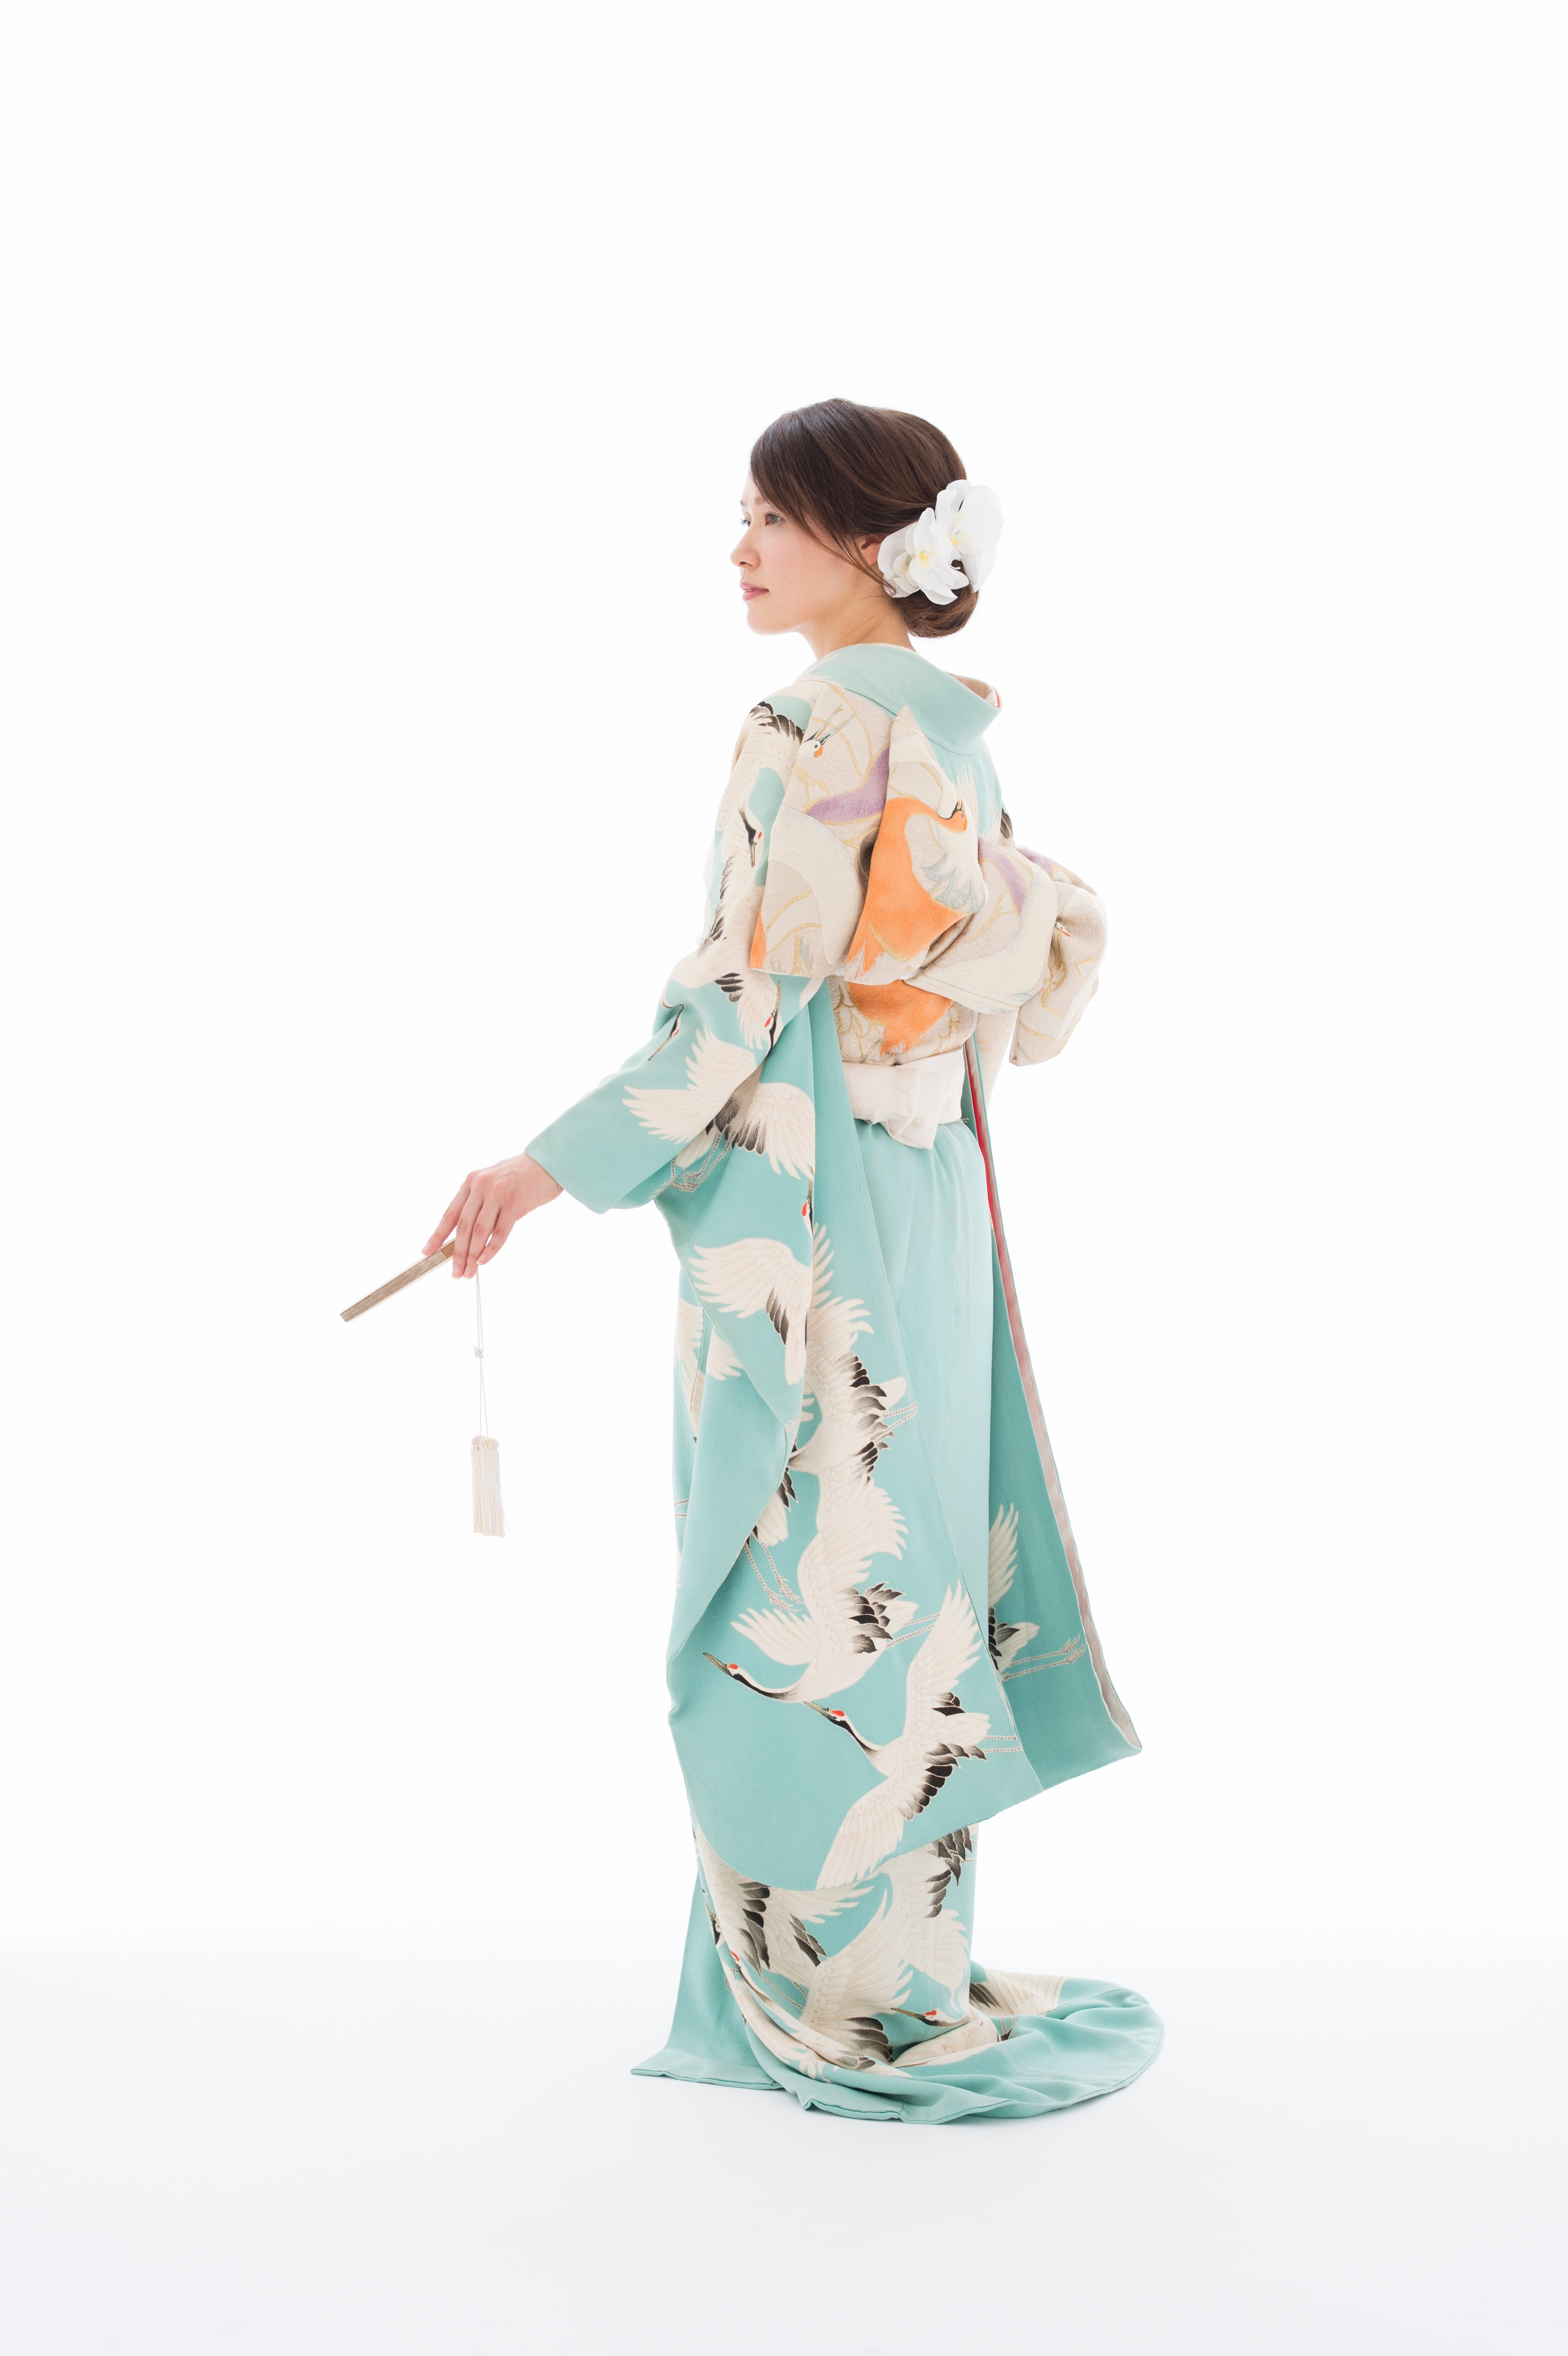 953395c6c8921 結婚式は和装が着たい!白無垢・色打掛・引き振袖の種類や髪型を知ろう ...